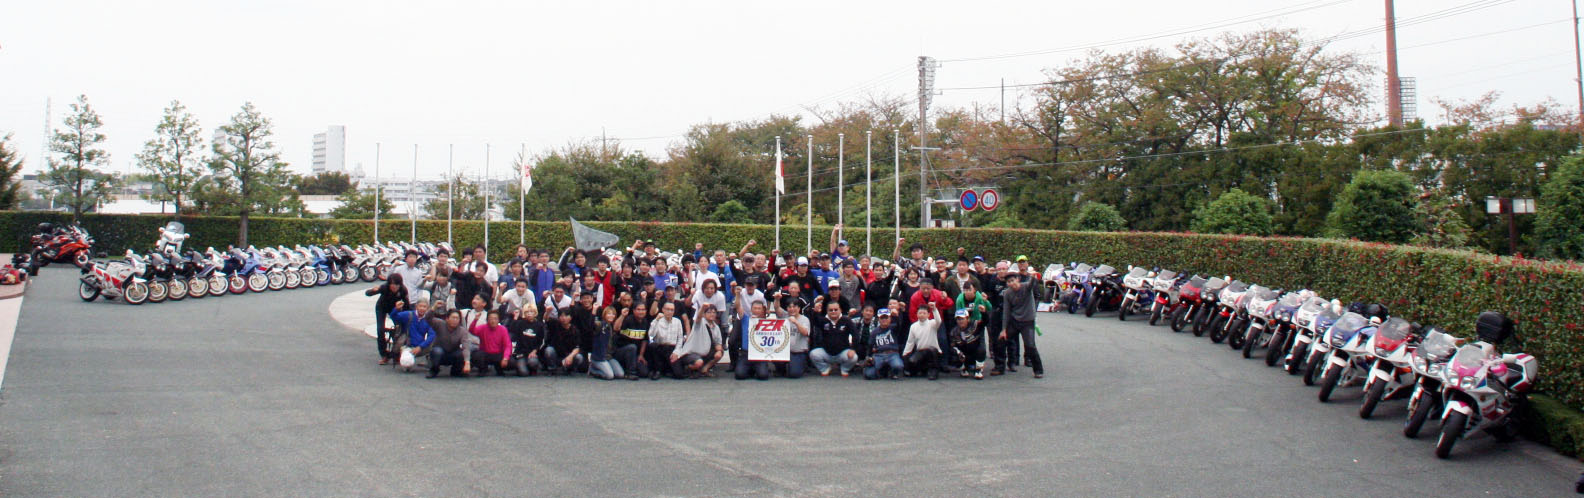 FZR Club Of Japan Info